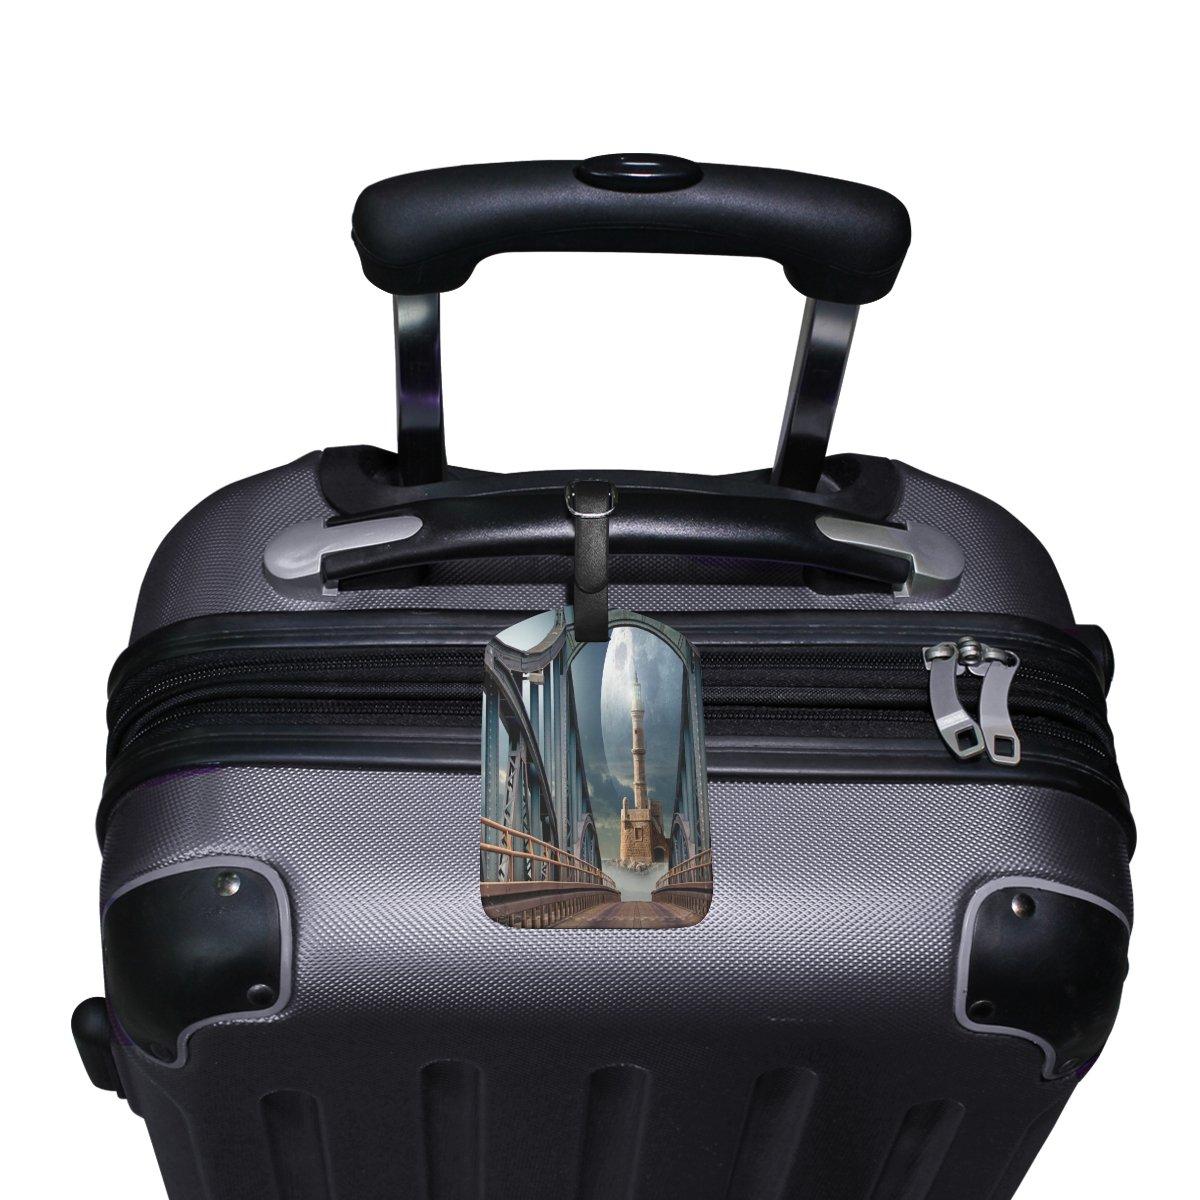 Saobao Travel Luggage Tag Bridge PU Leather Baggage Suitcase Travel ID Bag Tag 1Pcs